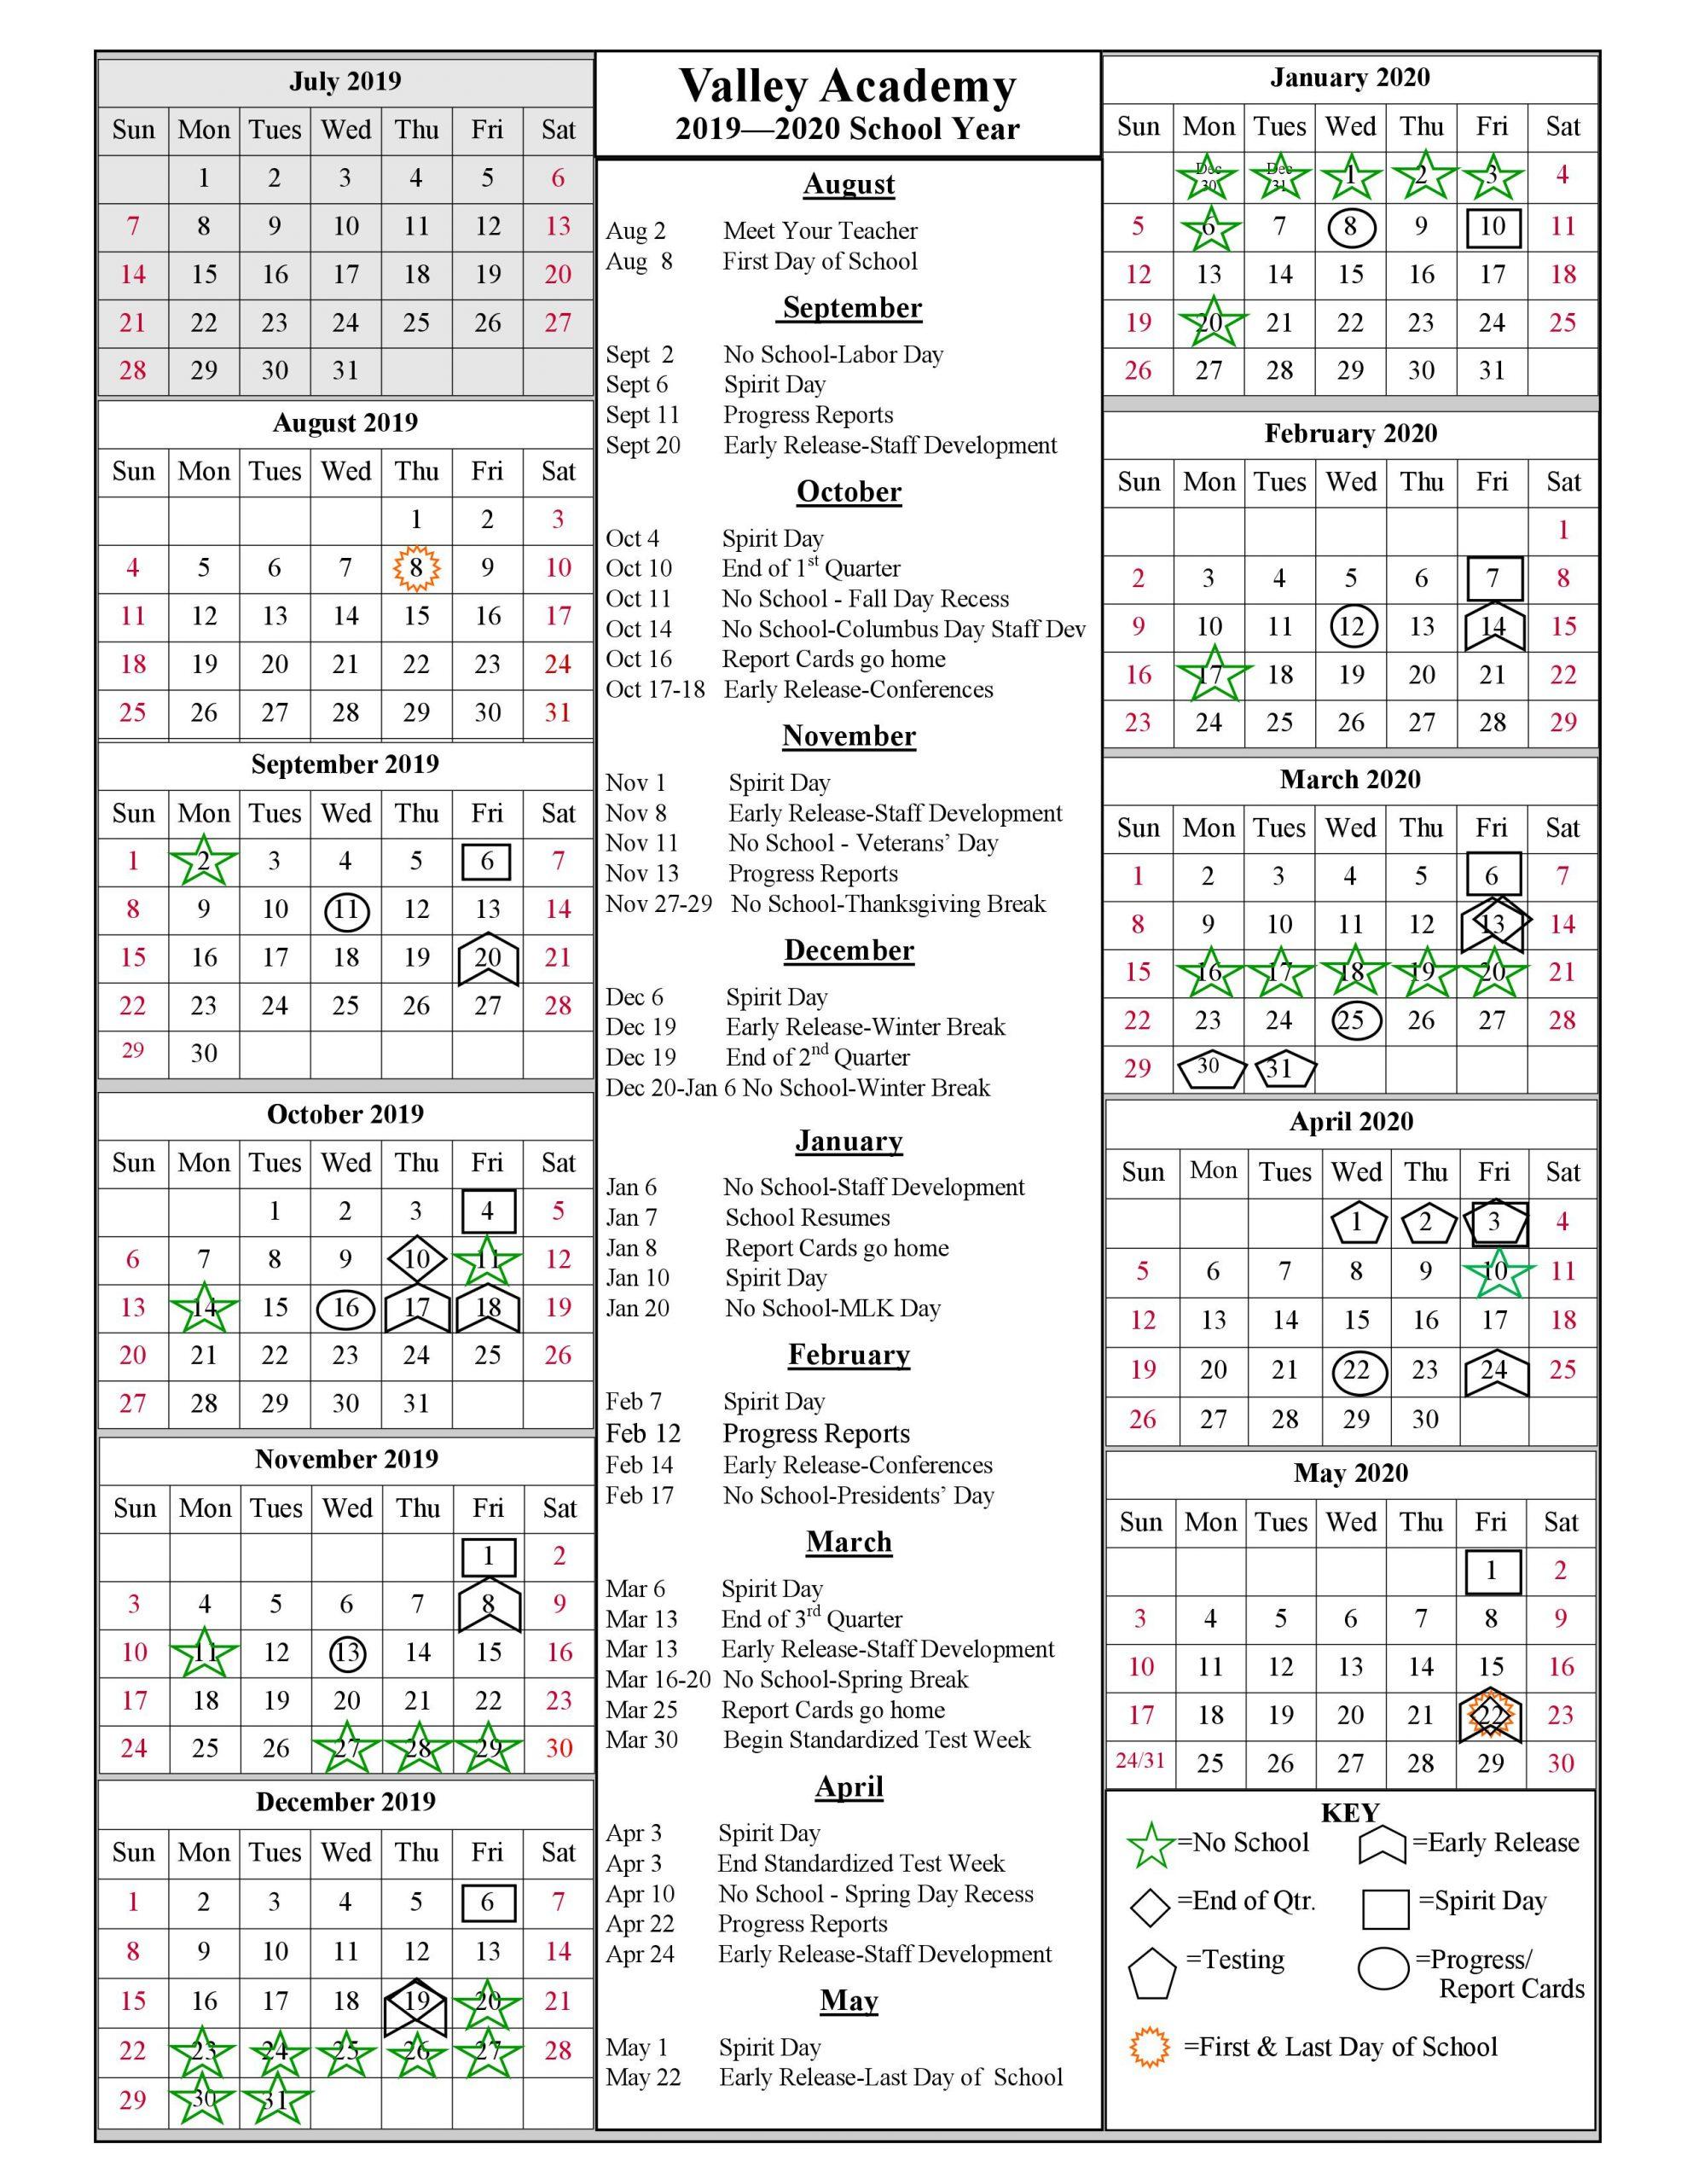 School Year Calendar 2019 2020   Valley Academy With Regard To Academic Year University Of Rhode Calendar